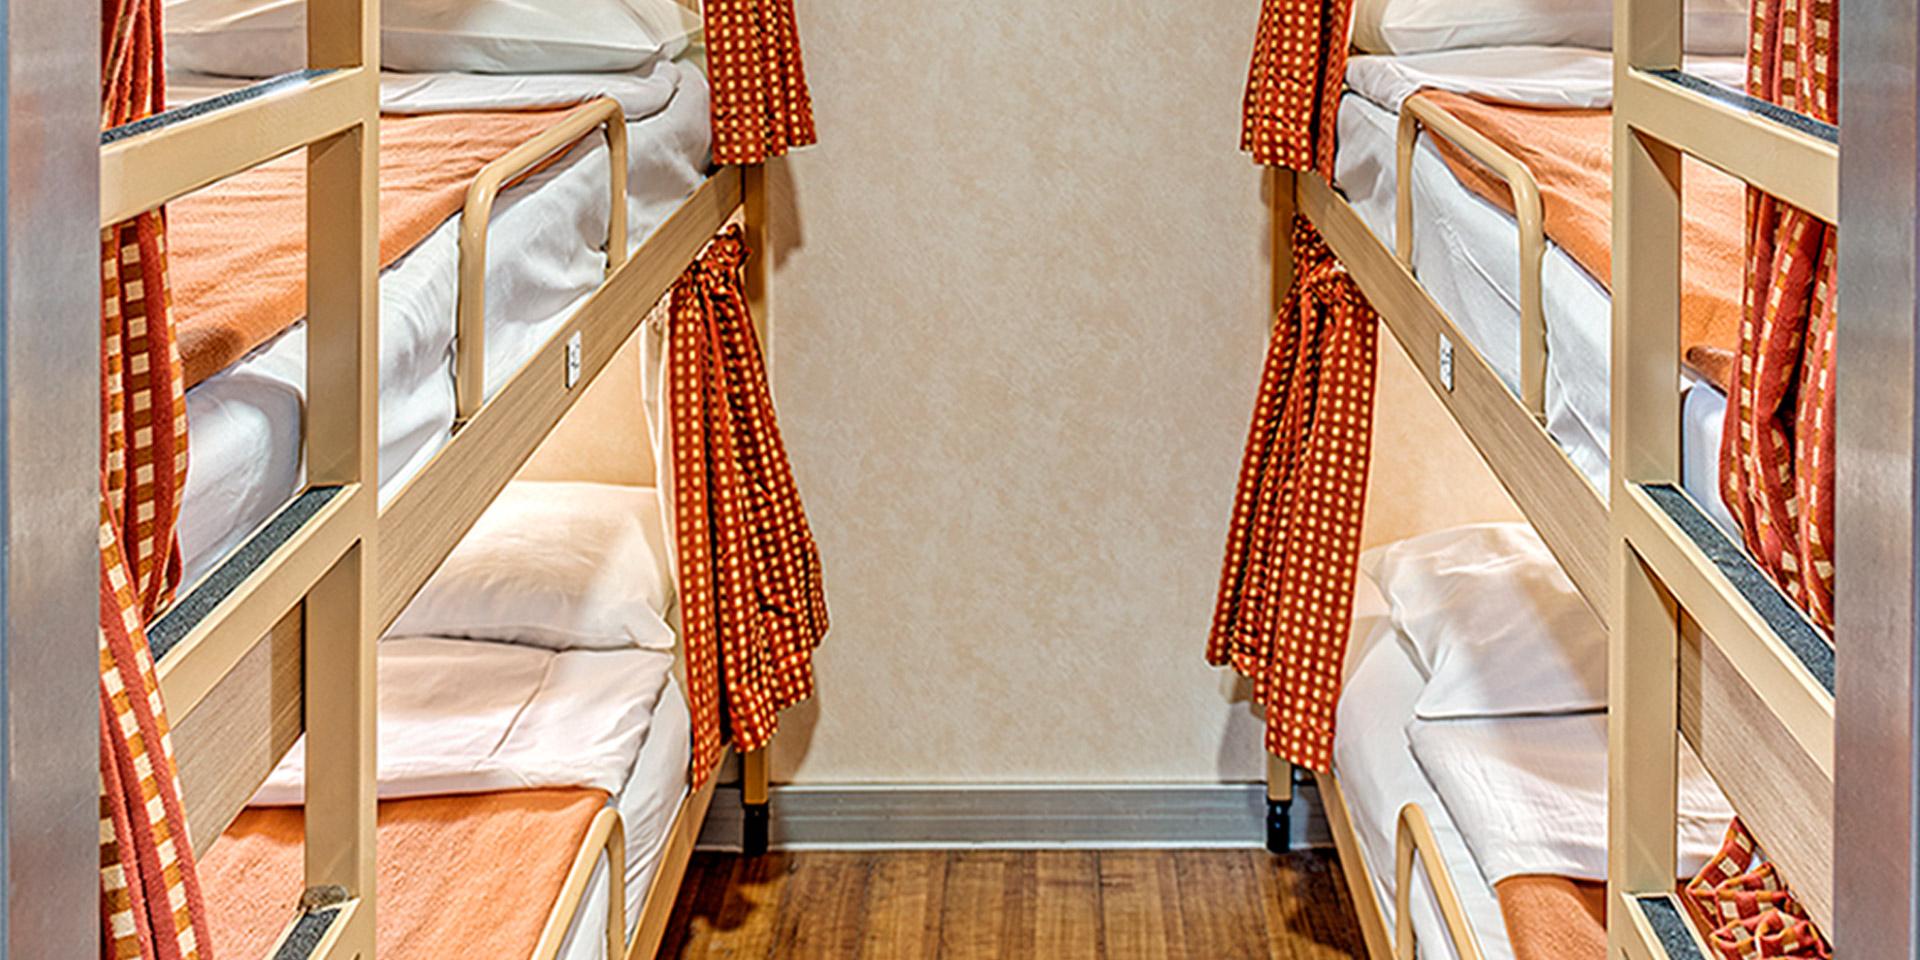 F/B Superfast XI 4 Bed inside cabin